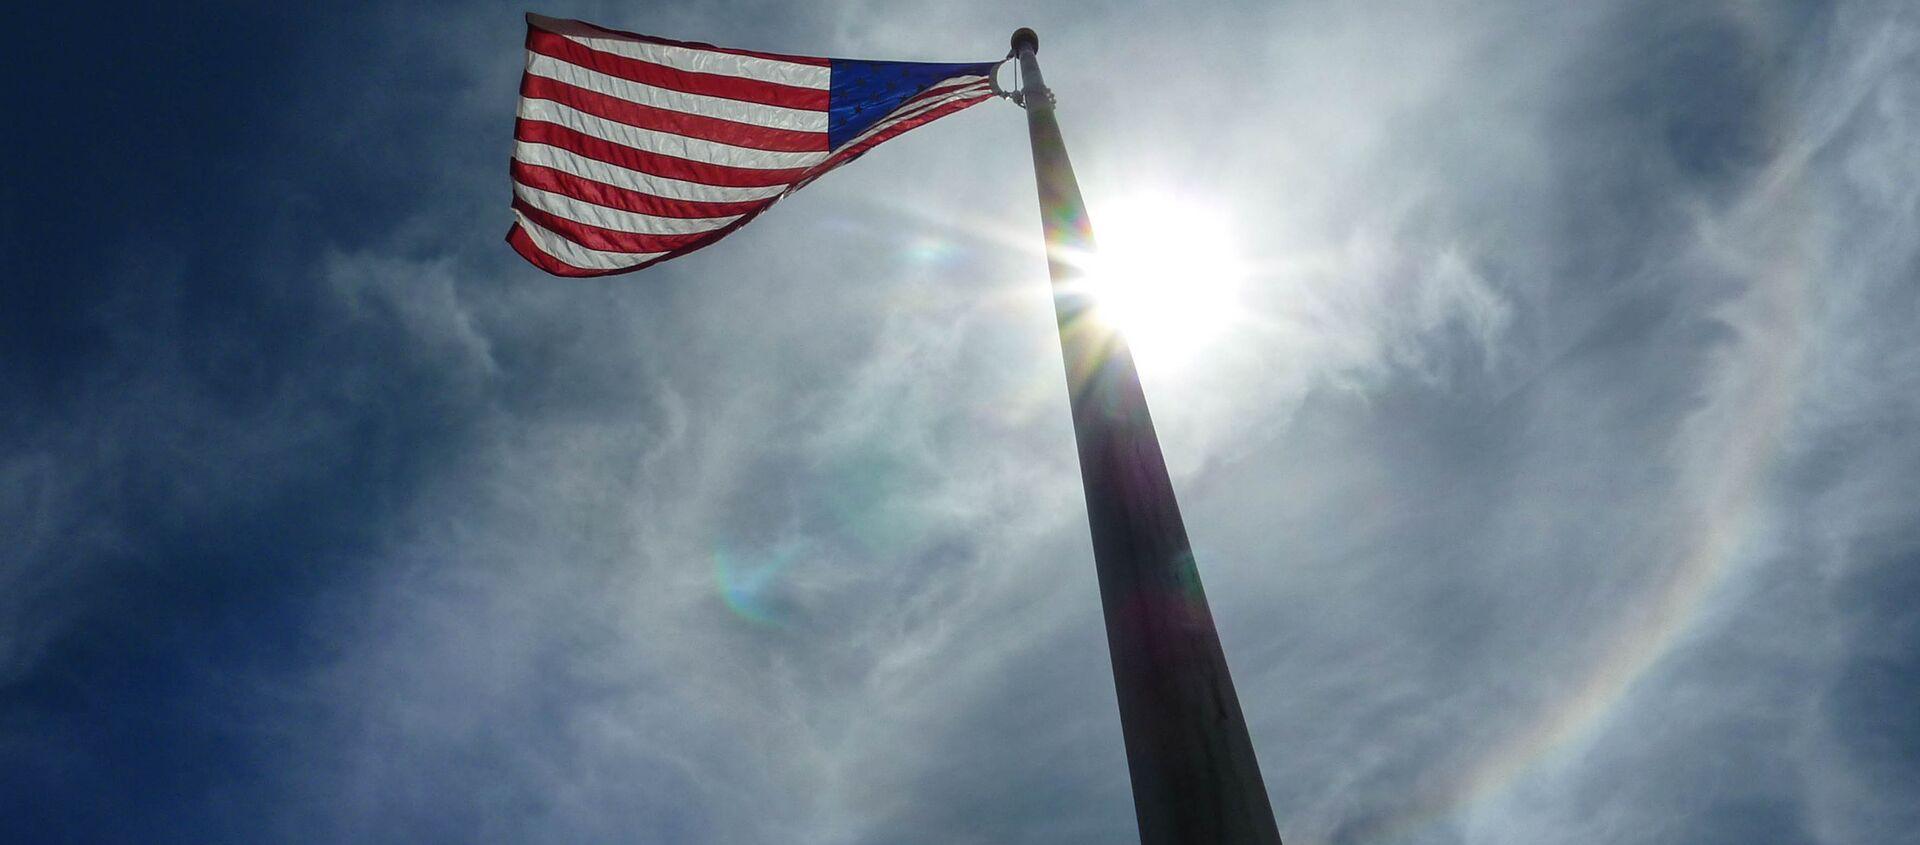 La bandiera americana - Sputnik Italia, 1920, 17.04.2021